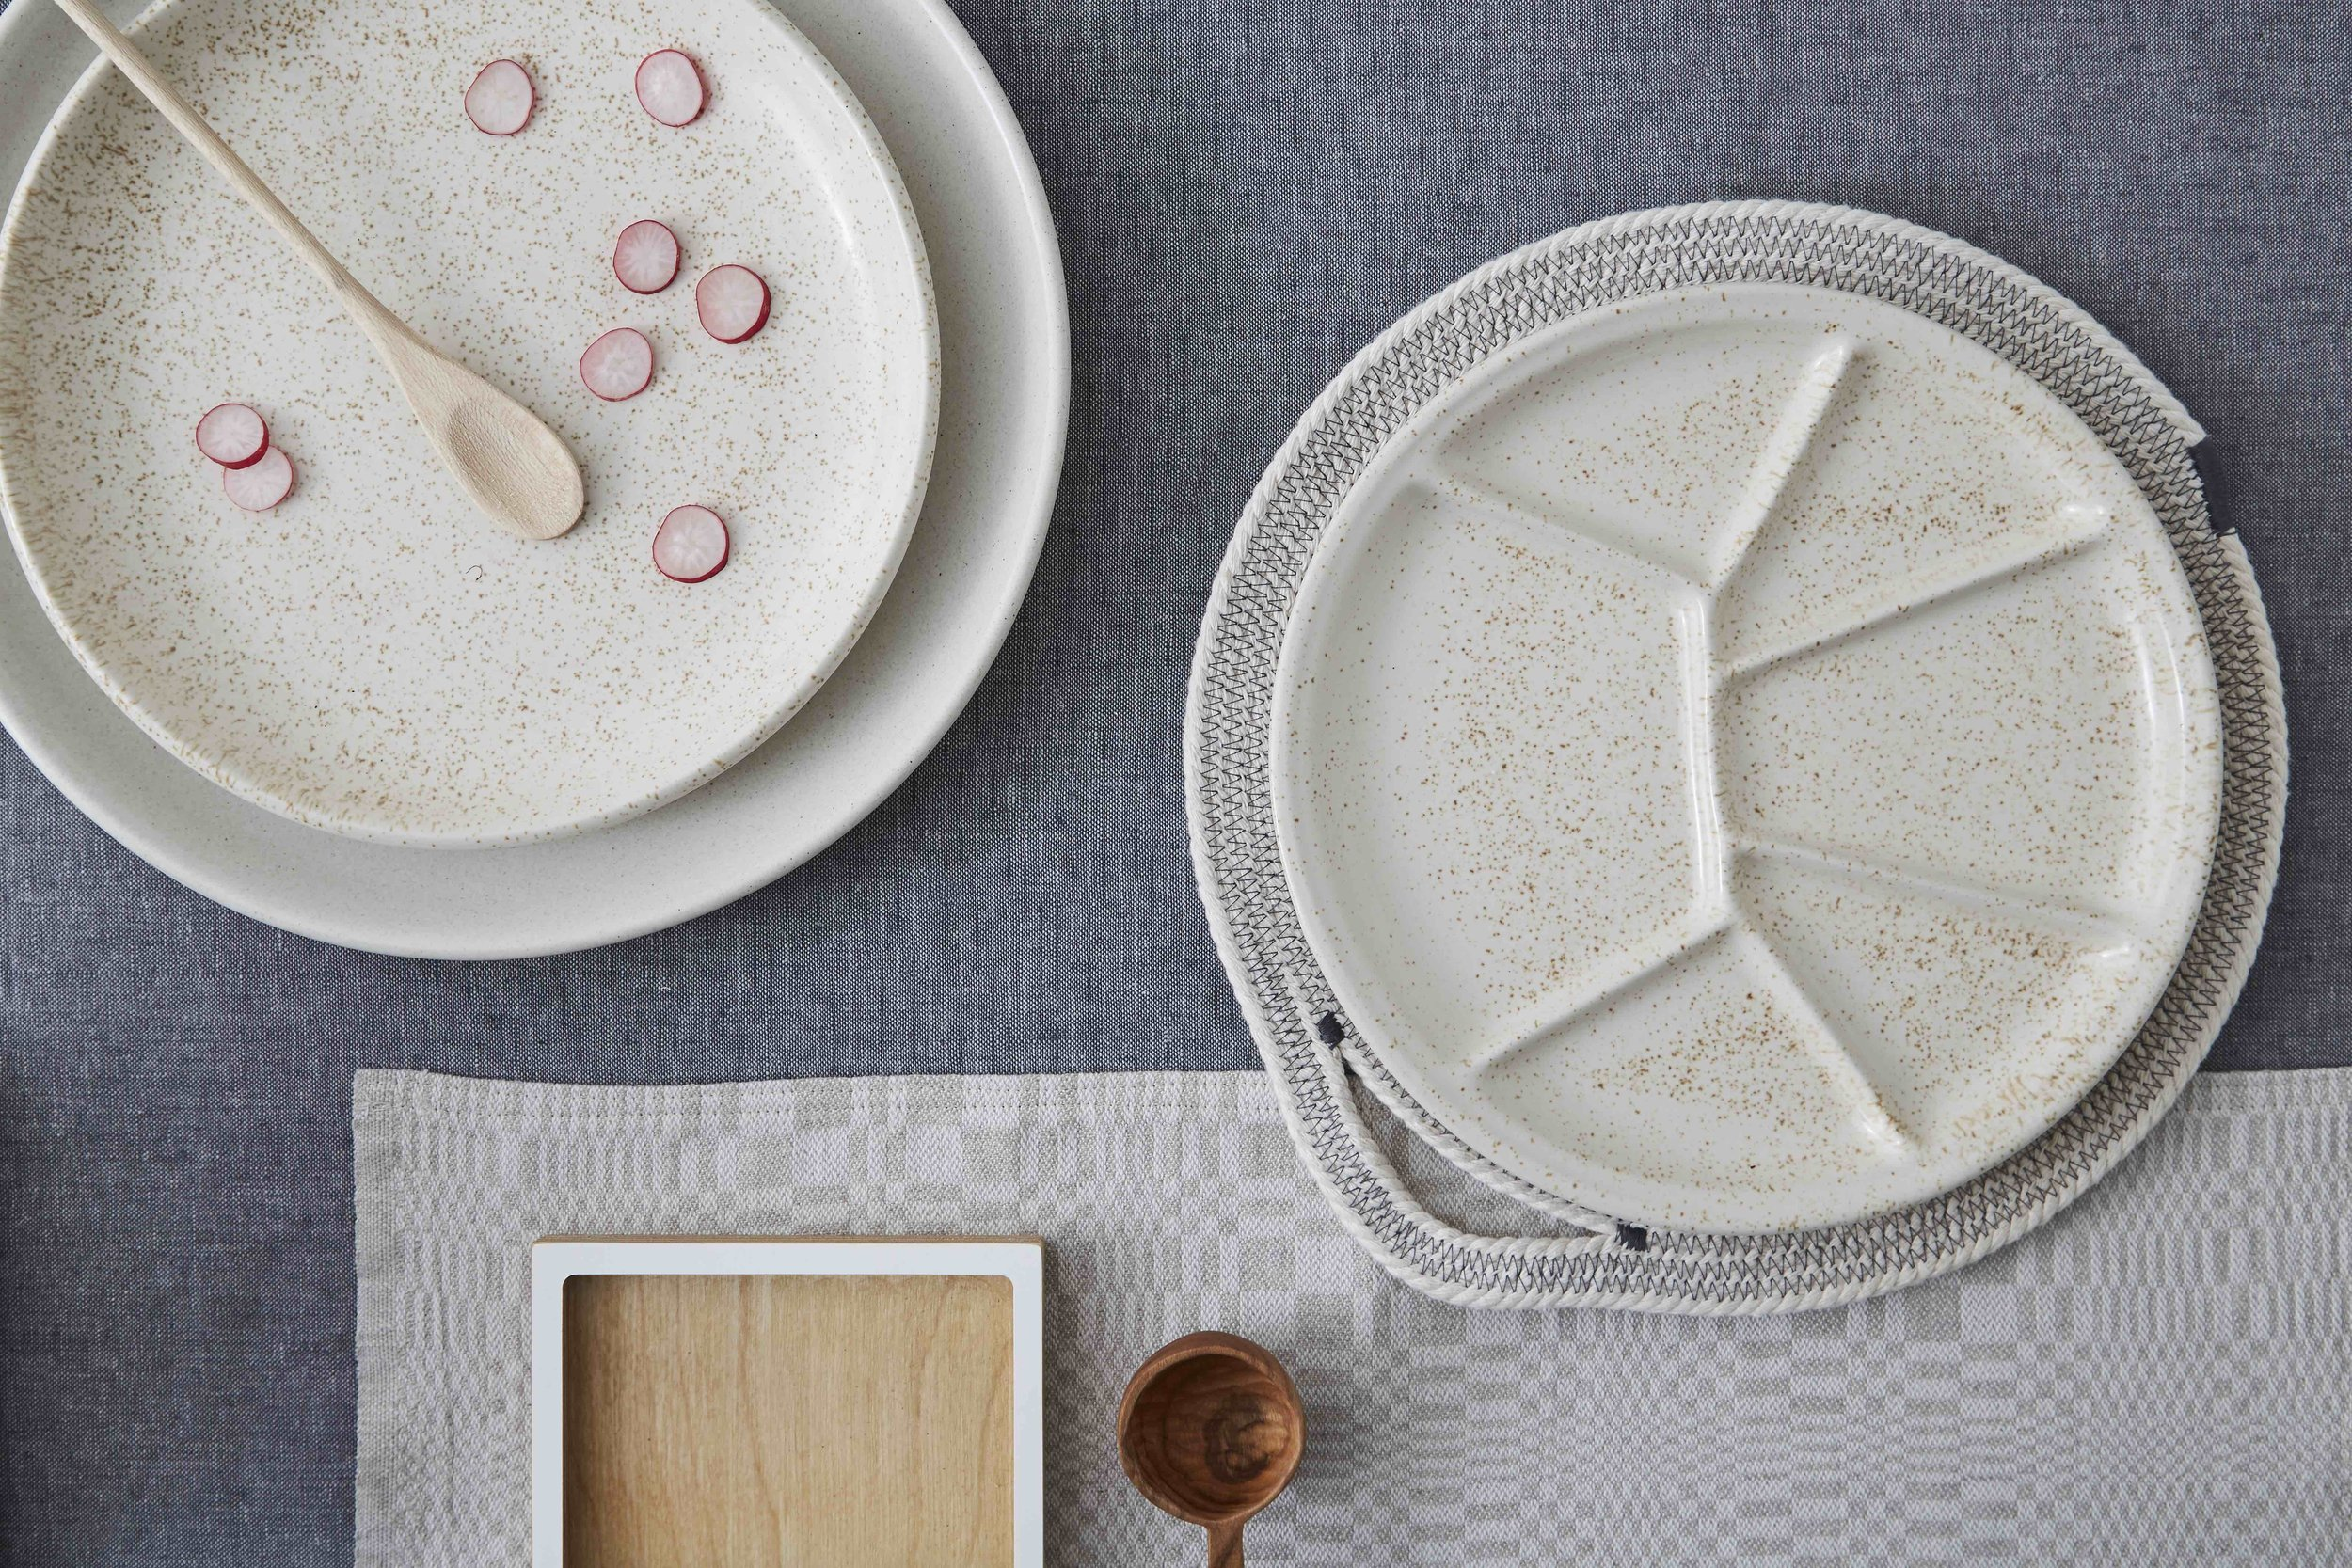 Minor Goods Speckled Stoneware Plates flatlay high res.jpg